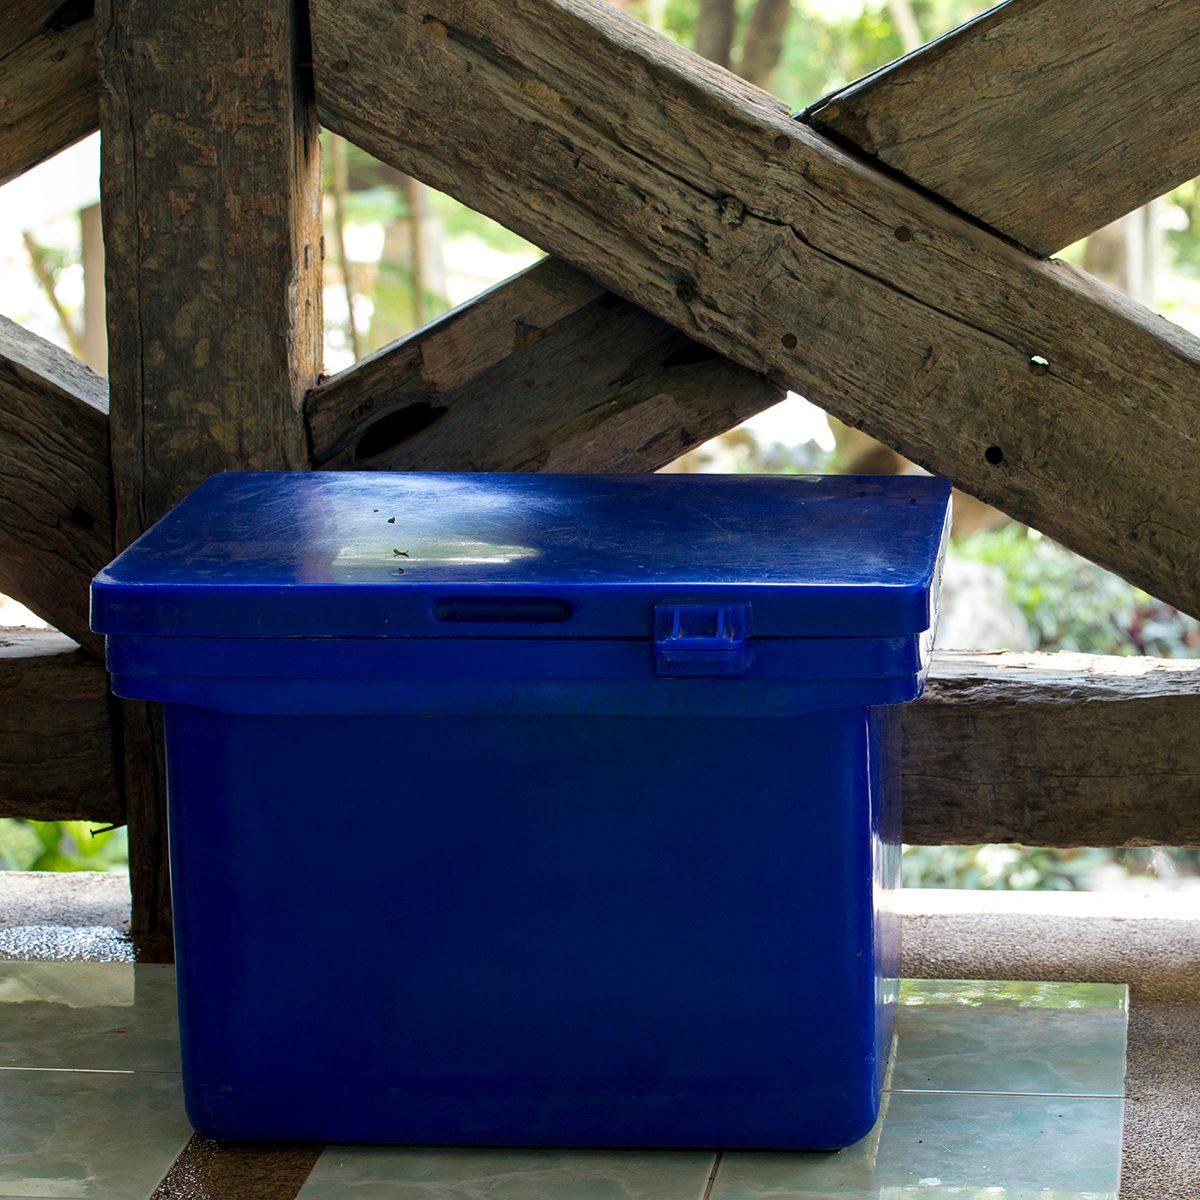 Blue plastic ice containment box.